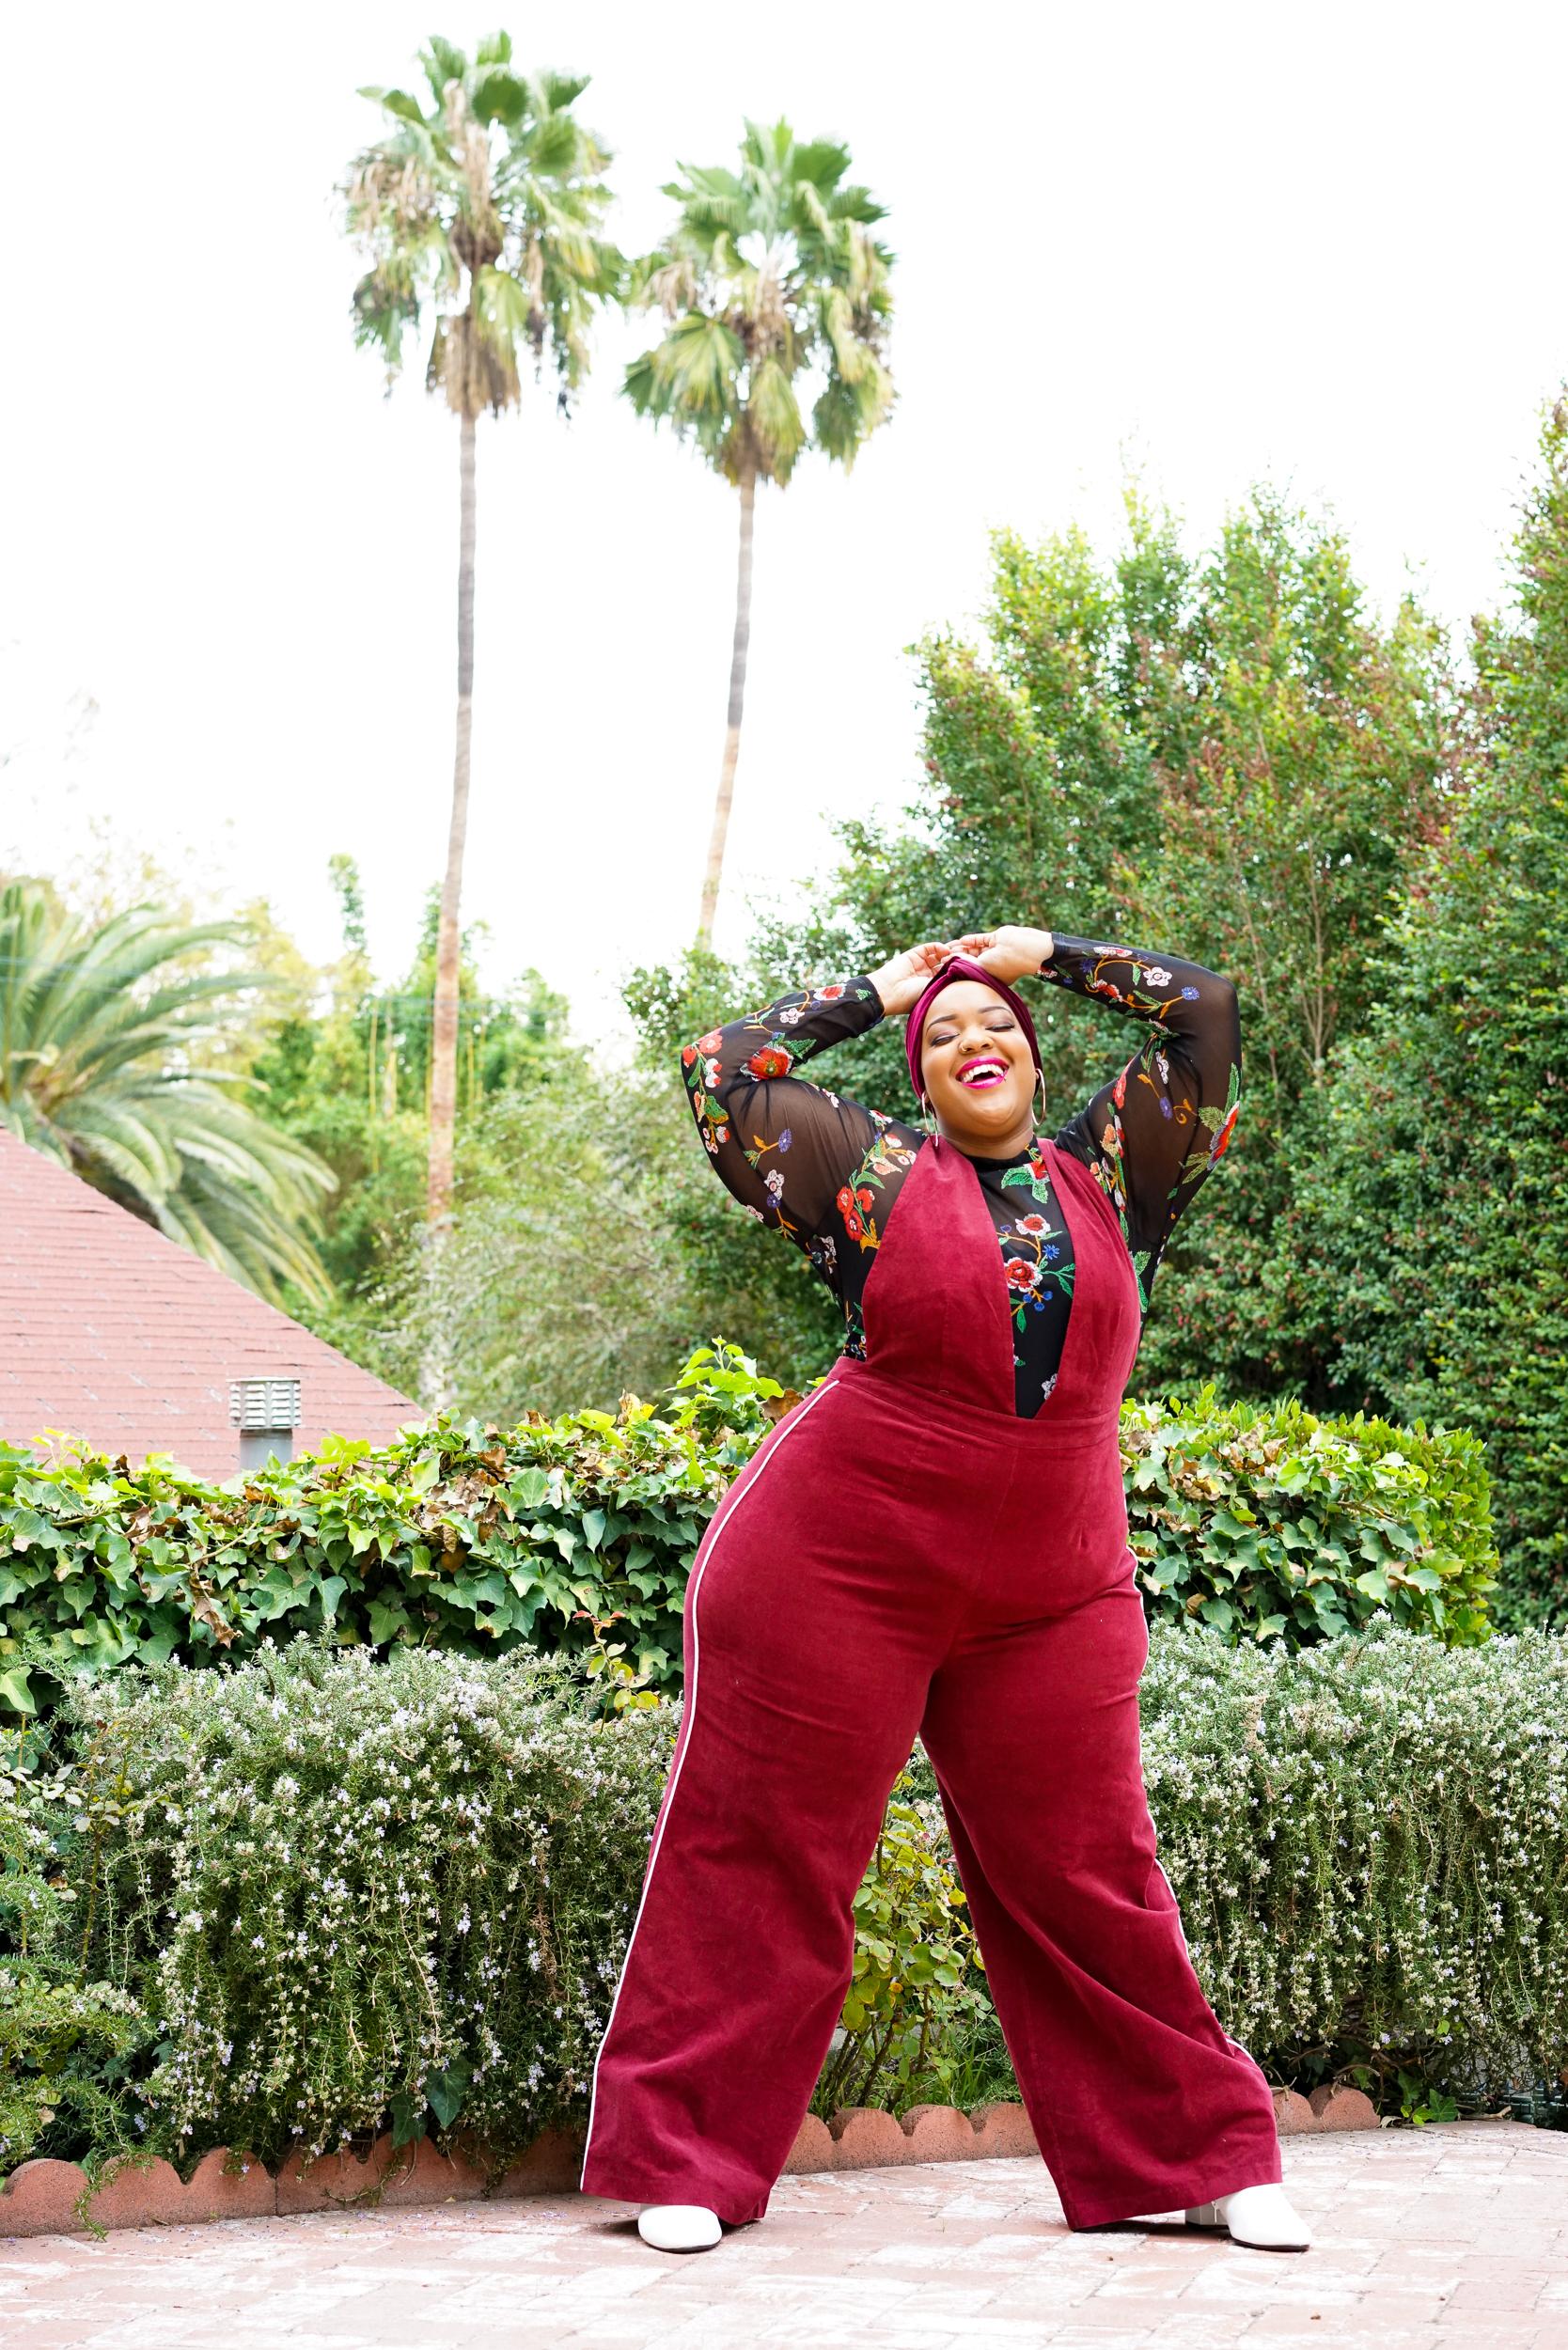 Leah-Vernon-Plus-Size-Body-Positive-Muslim-Girl-Model-Detroit-London-Blogger-Instagram-1.jpg